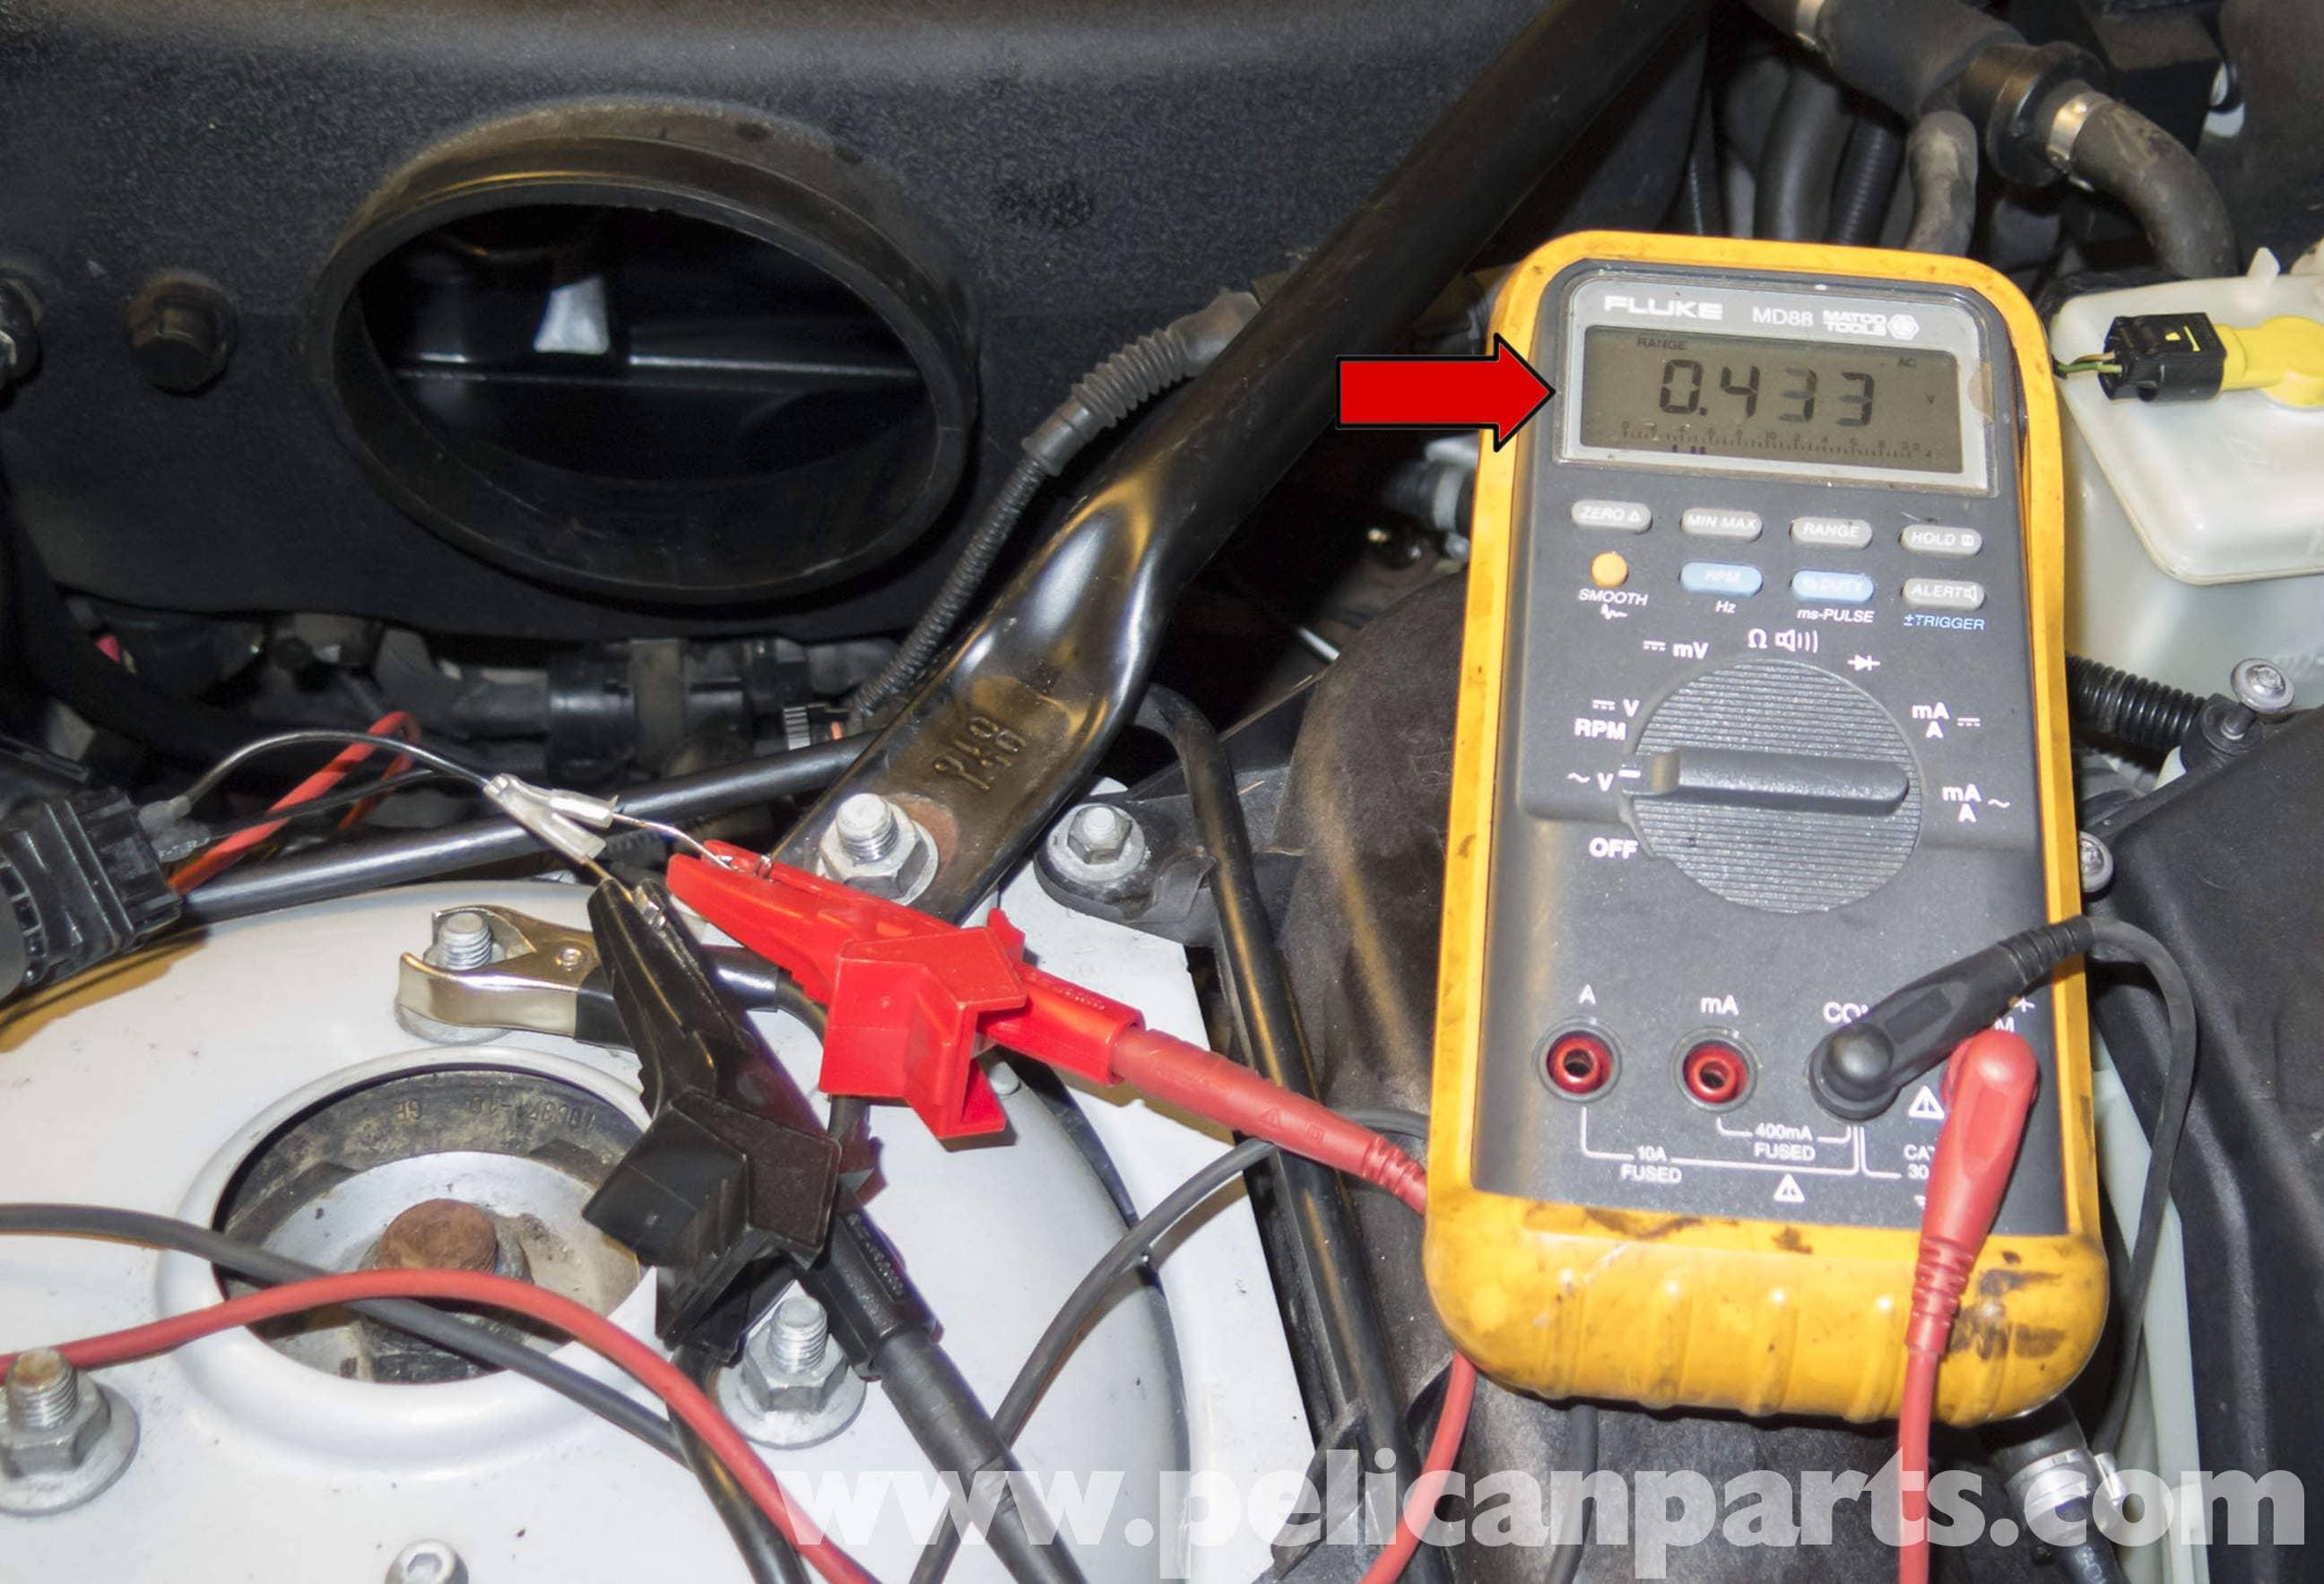 BMW S54 Crankshaft Sensor Testing | E46 M3 Coupe/Convertible (2001